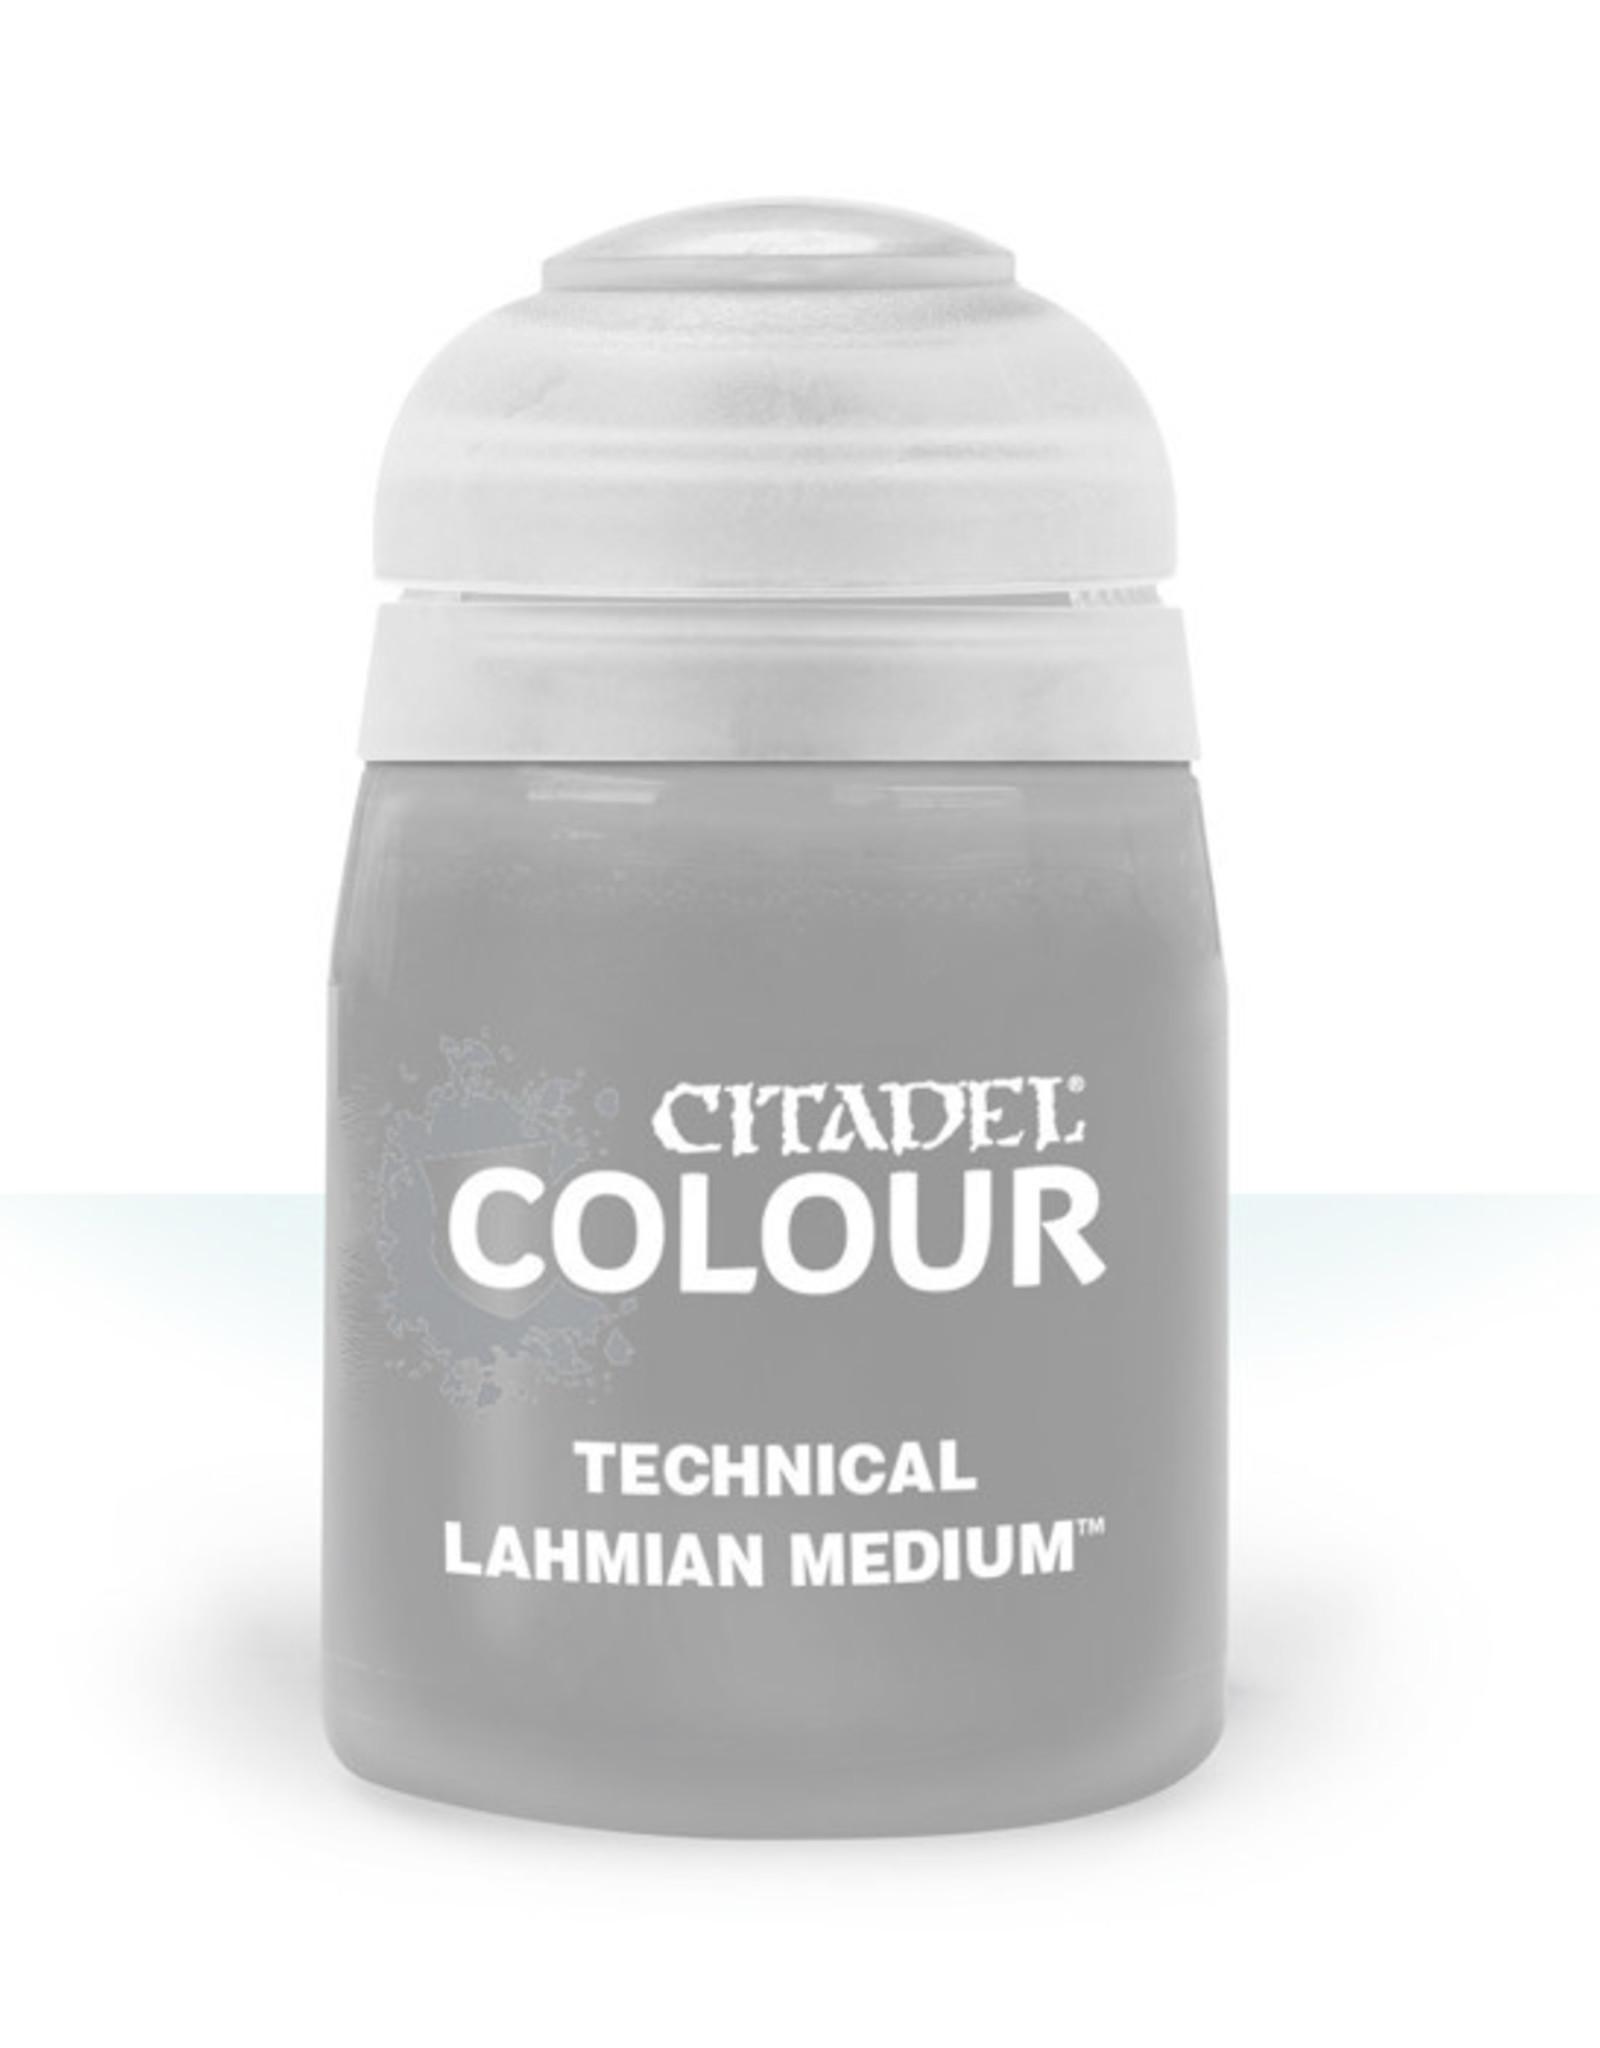 Citadel Citadel Colour: Technical - Lahmian Medium (24ML)